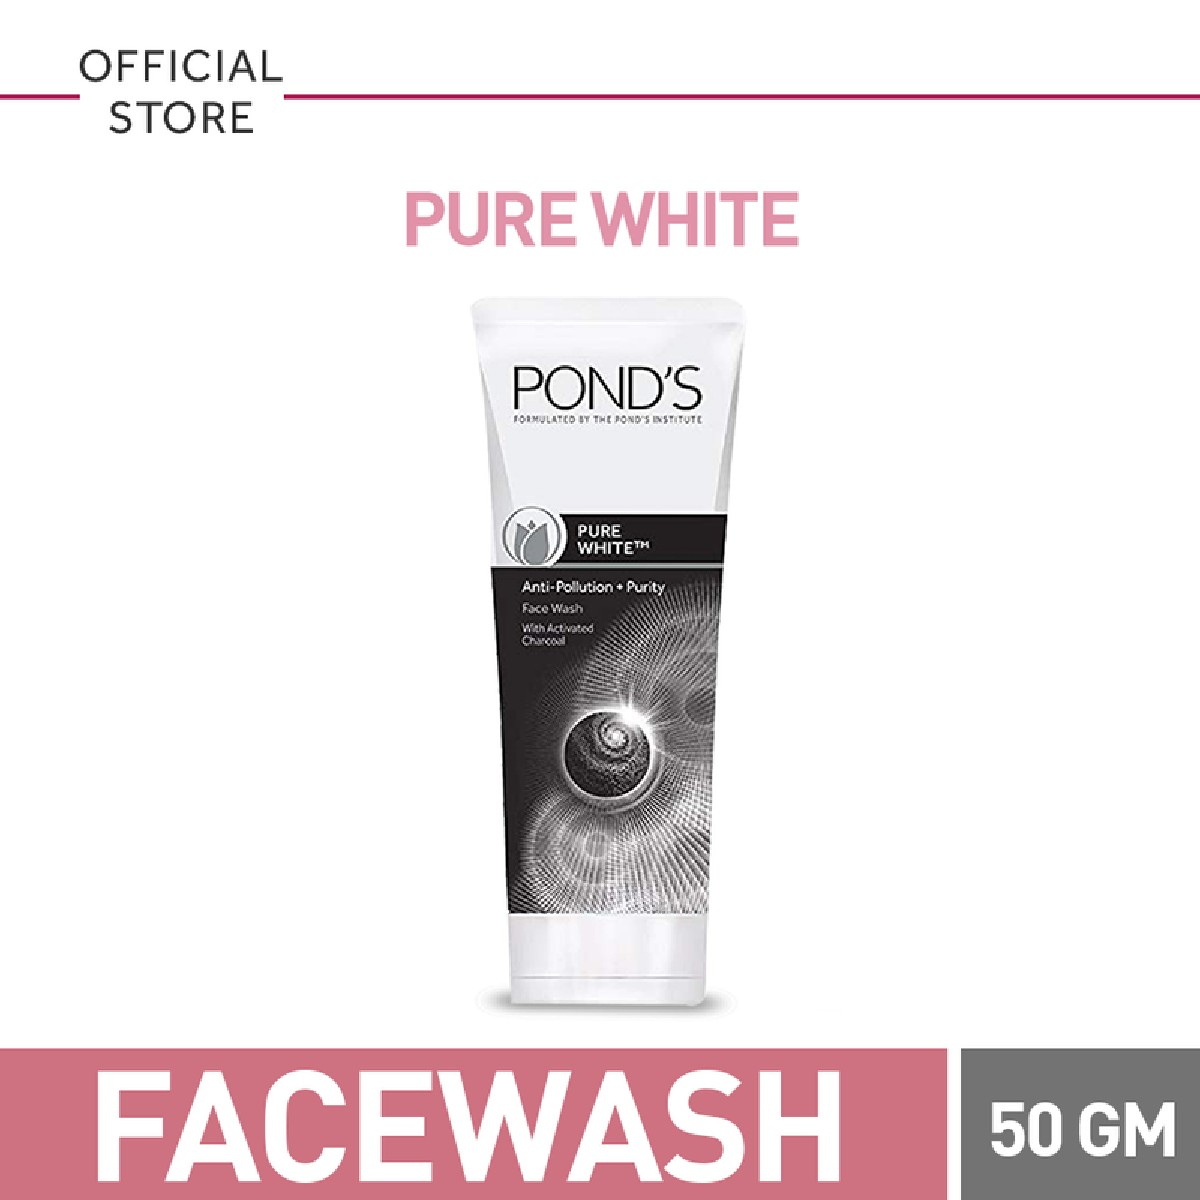 Ponds Pure White Face wash 50gm